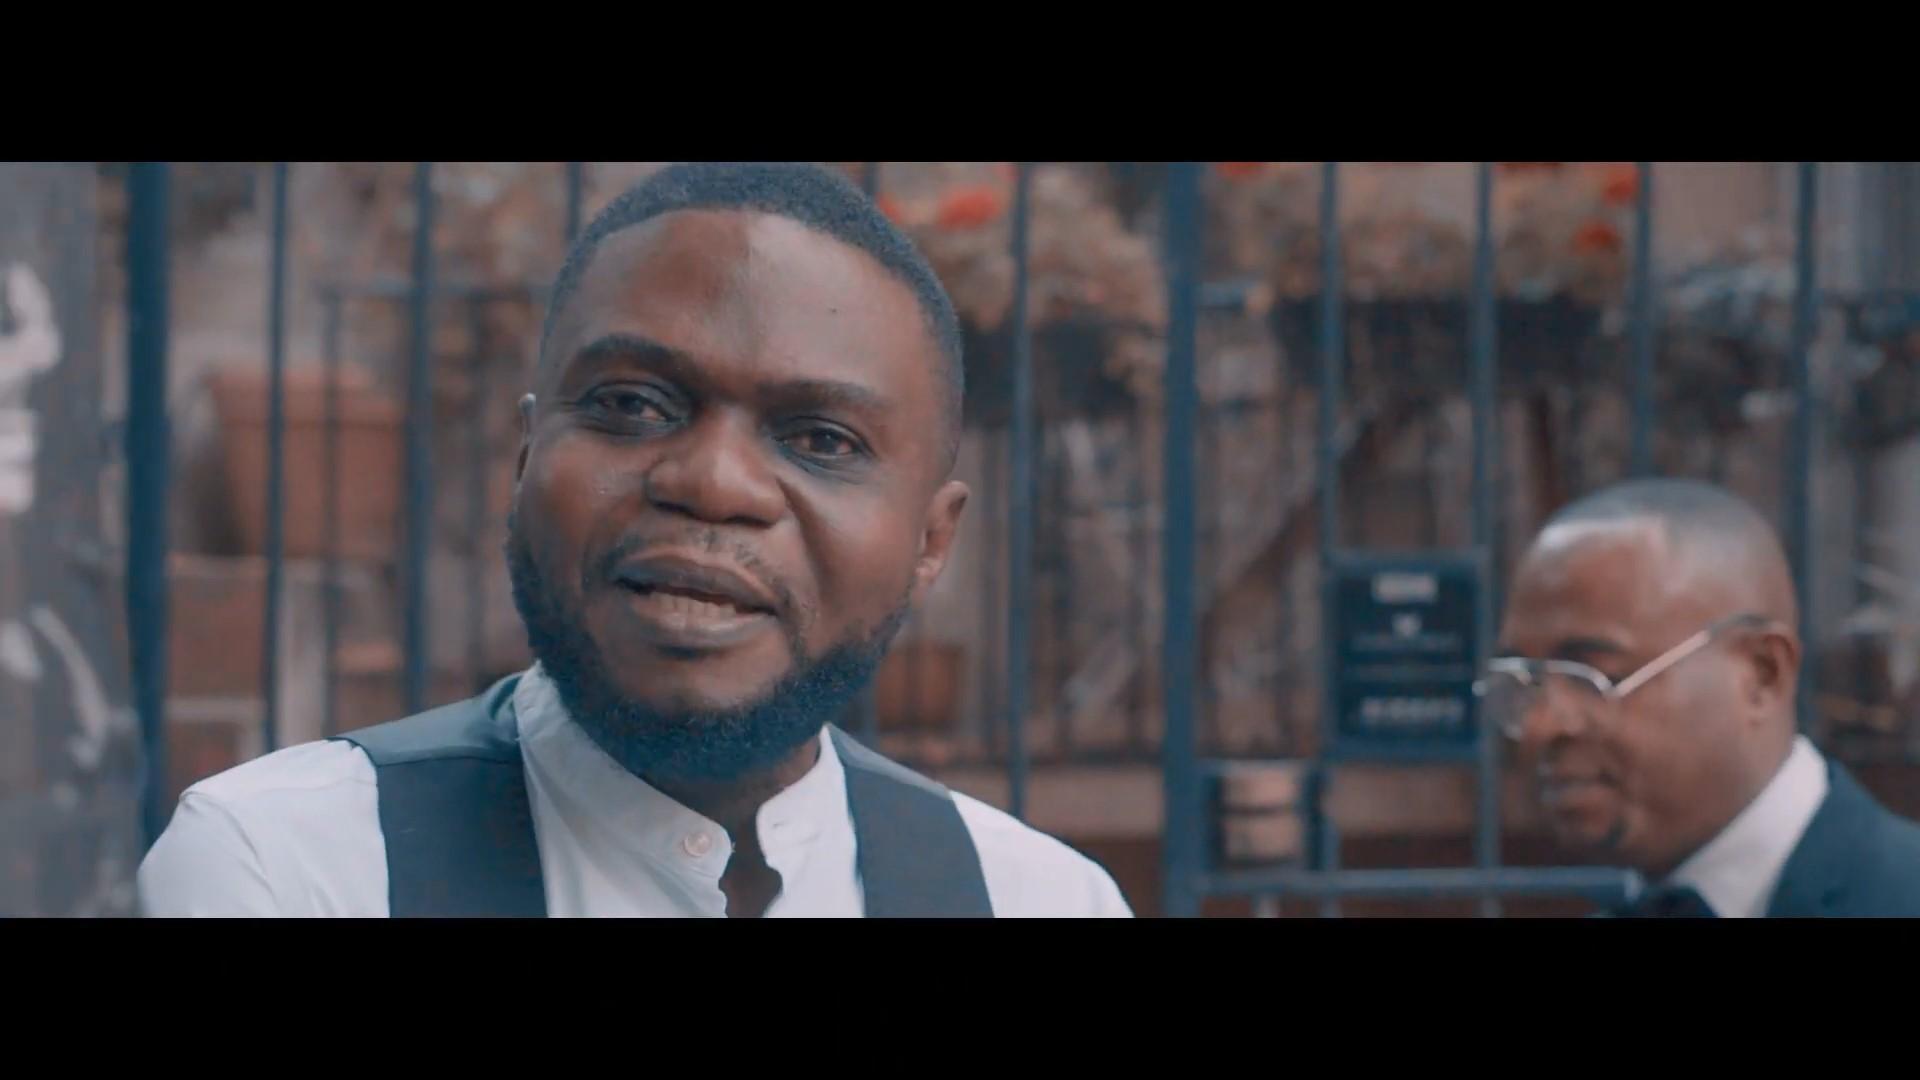 Lamour de ma vie aime nkanu featblaise binda clip officiel mp4 snapshot 02 21 512